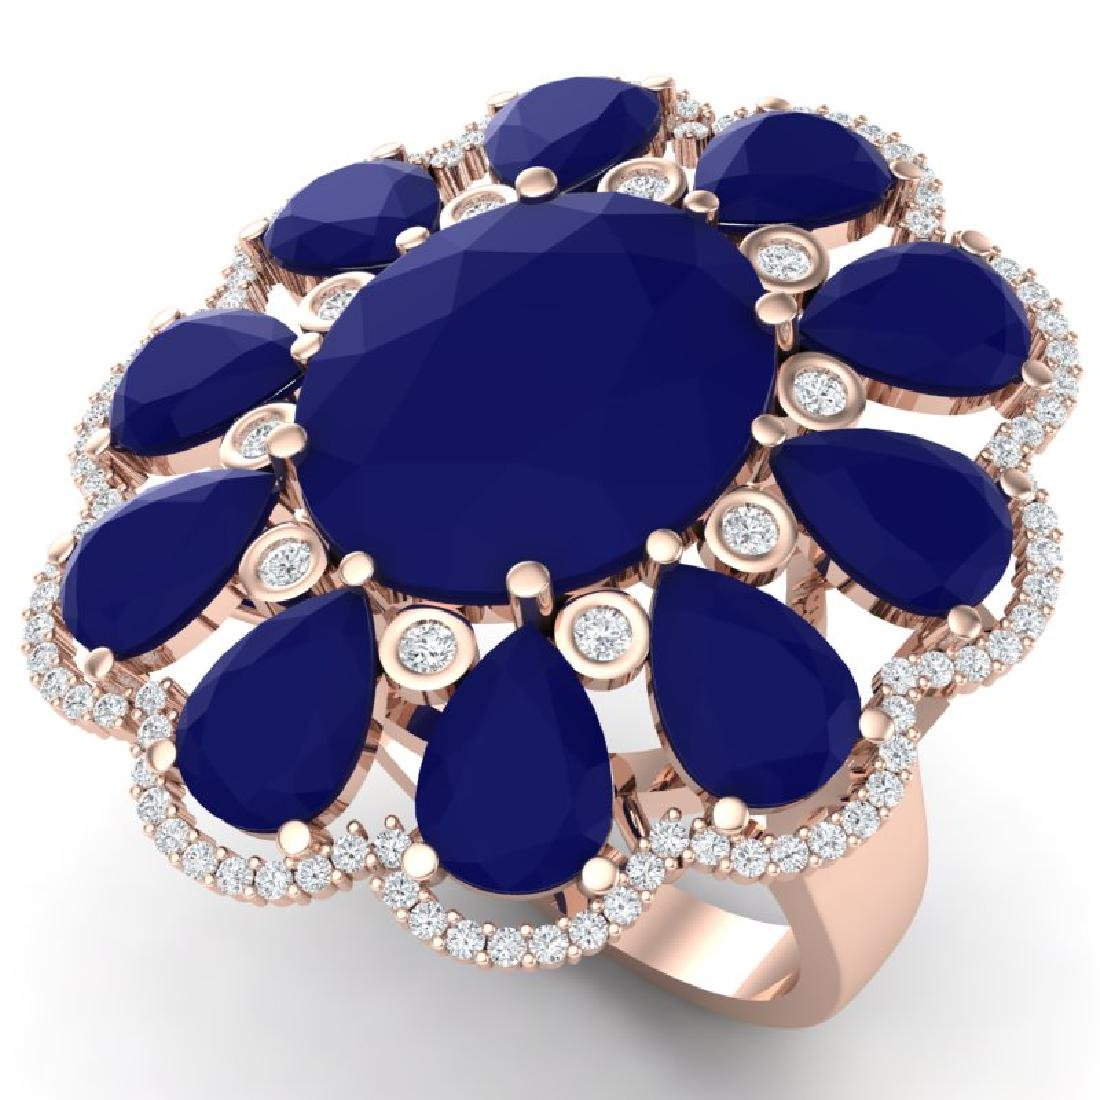 20.63 CTW Royalty Sapphire & VS Diamond Ring 18K Rose